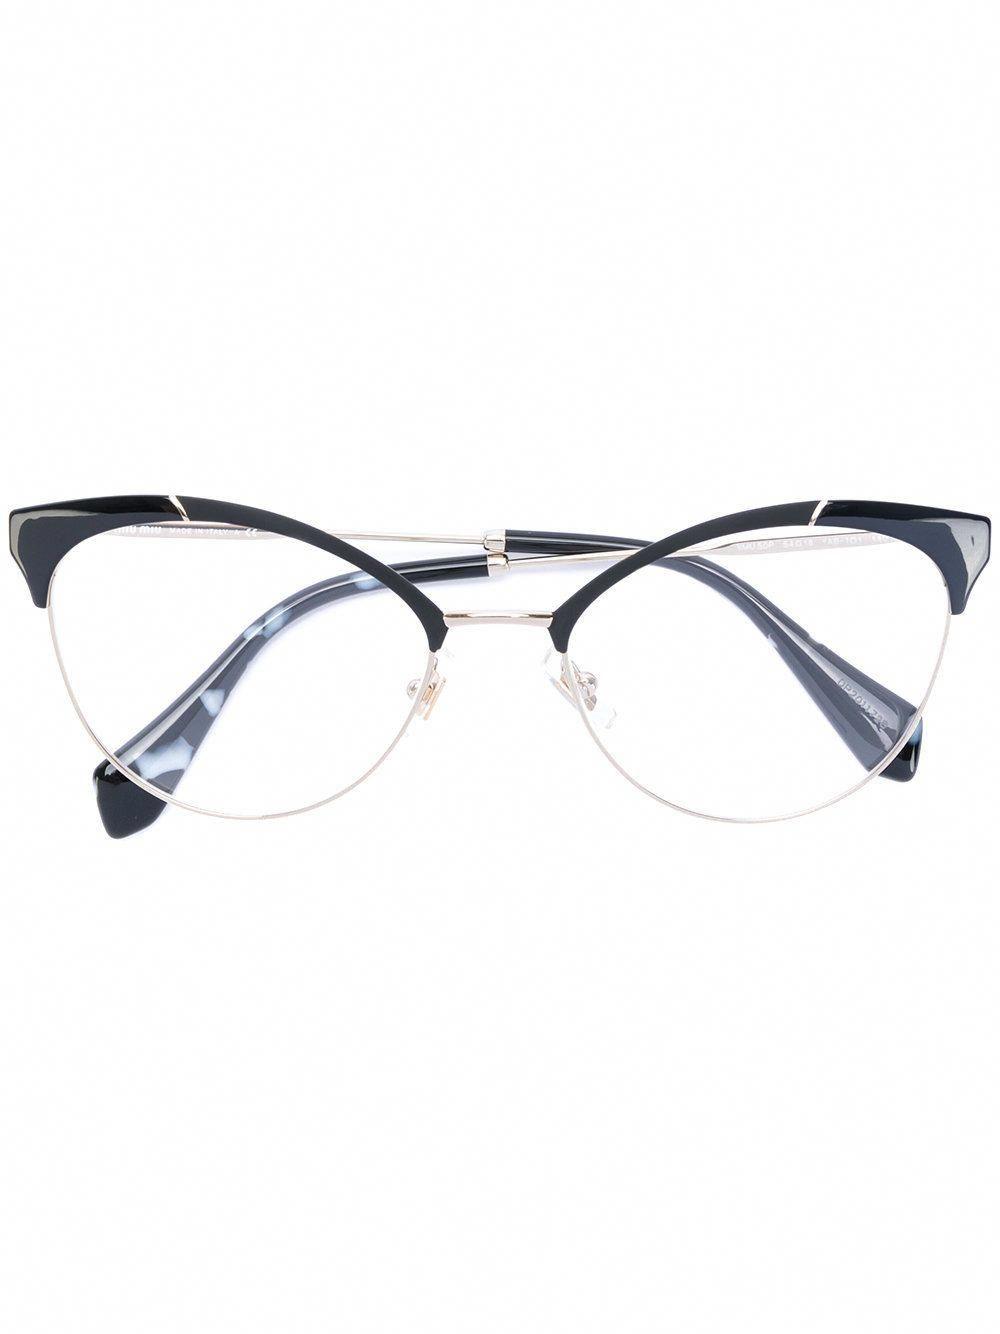 830dd99a96 Miu Miu Eyewear classic cat eye glasses  MiuMiu